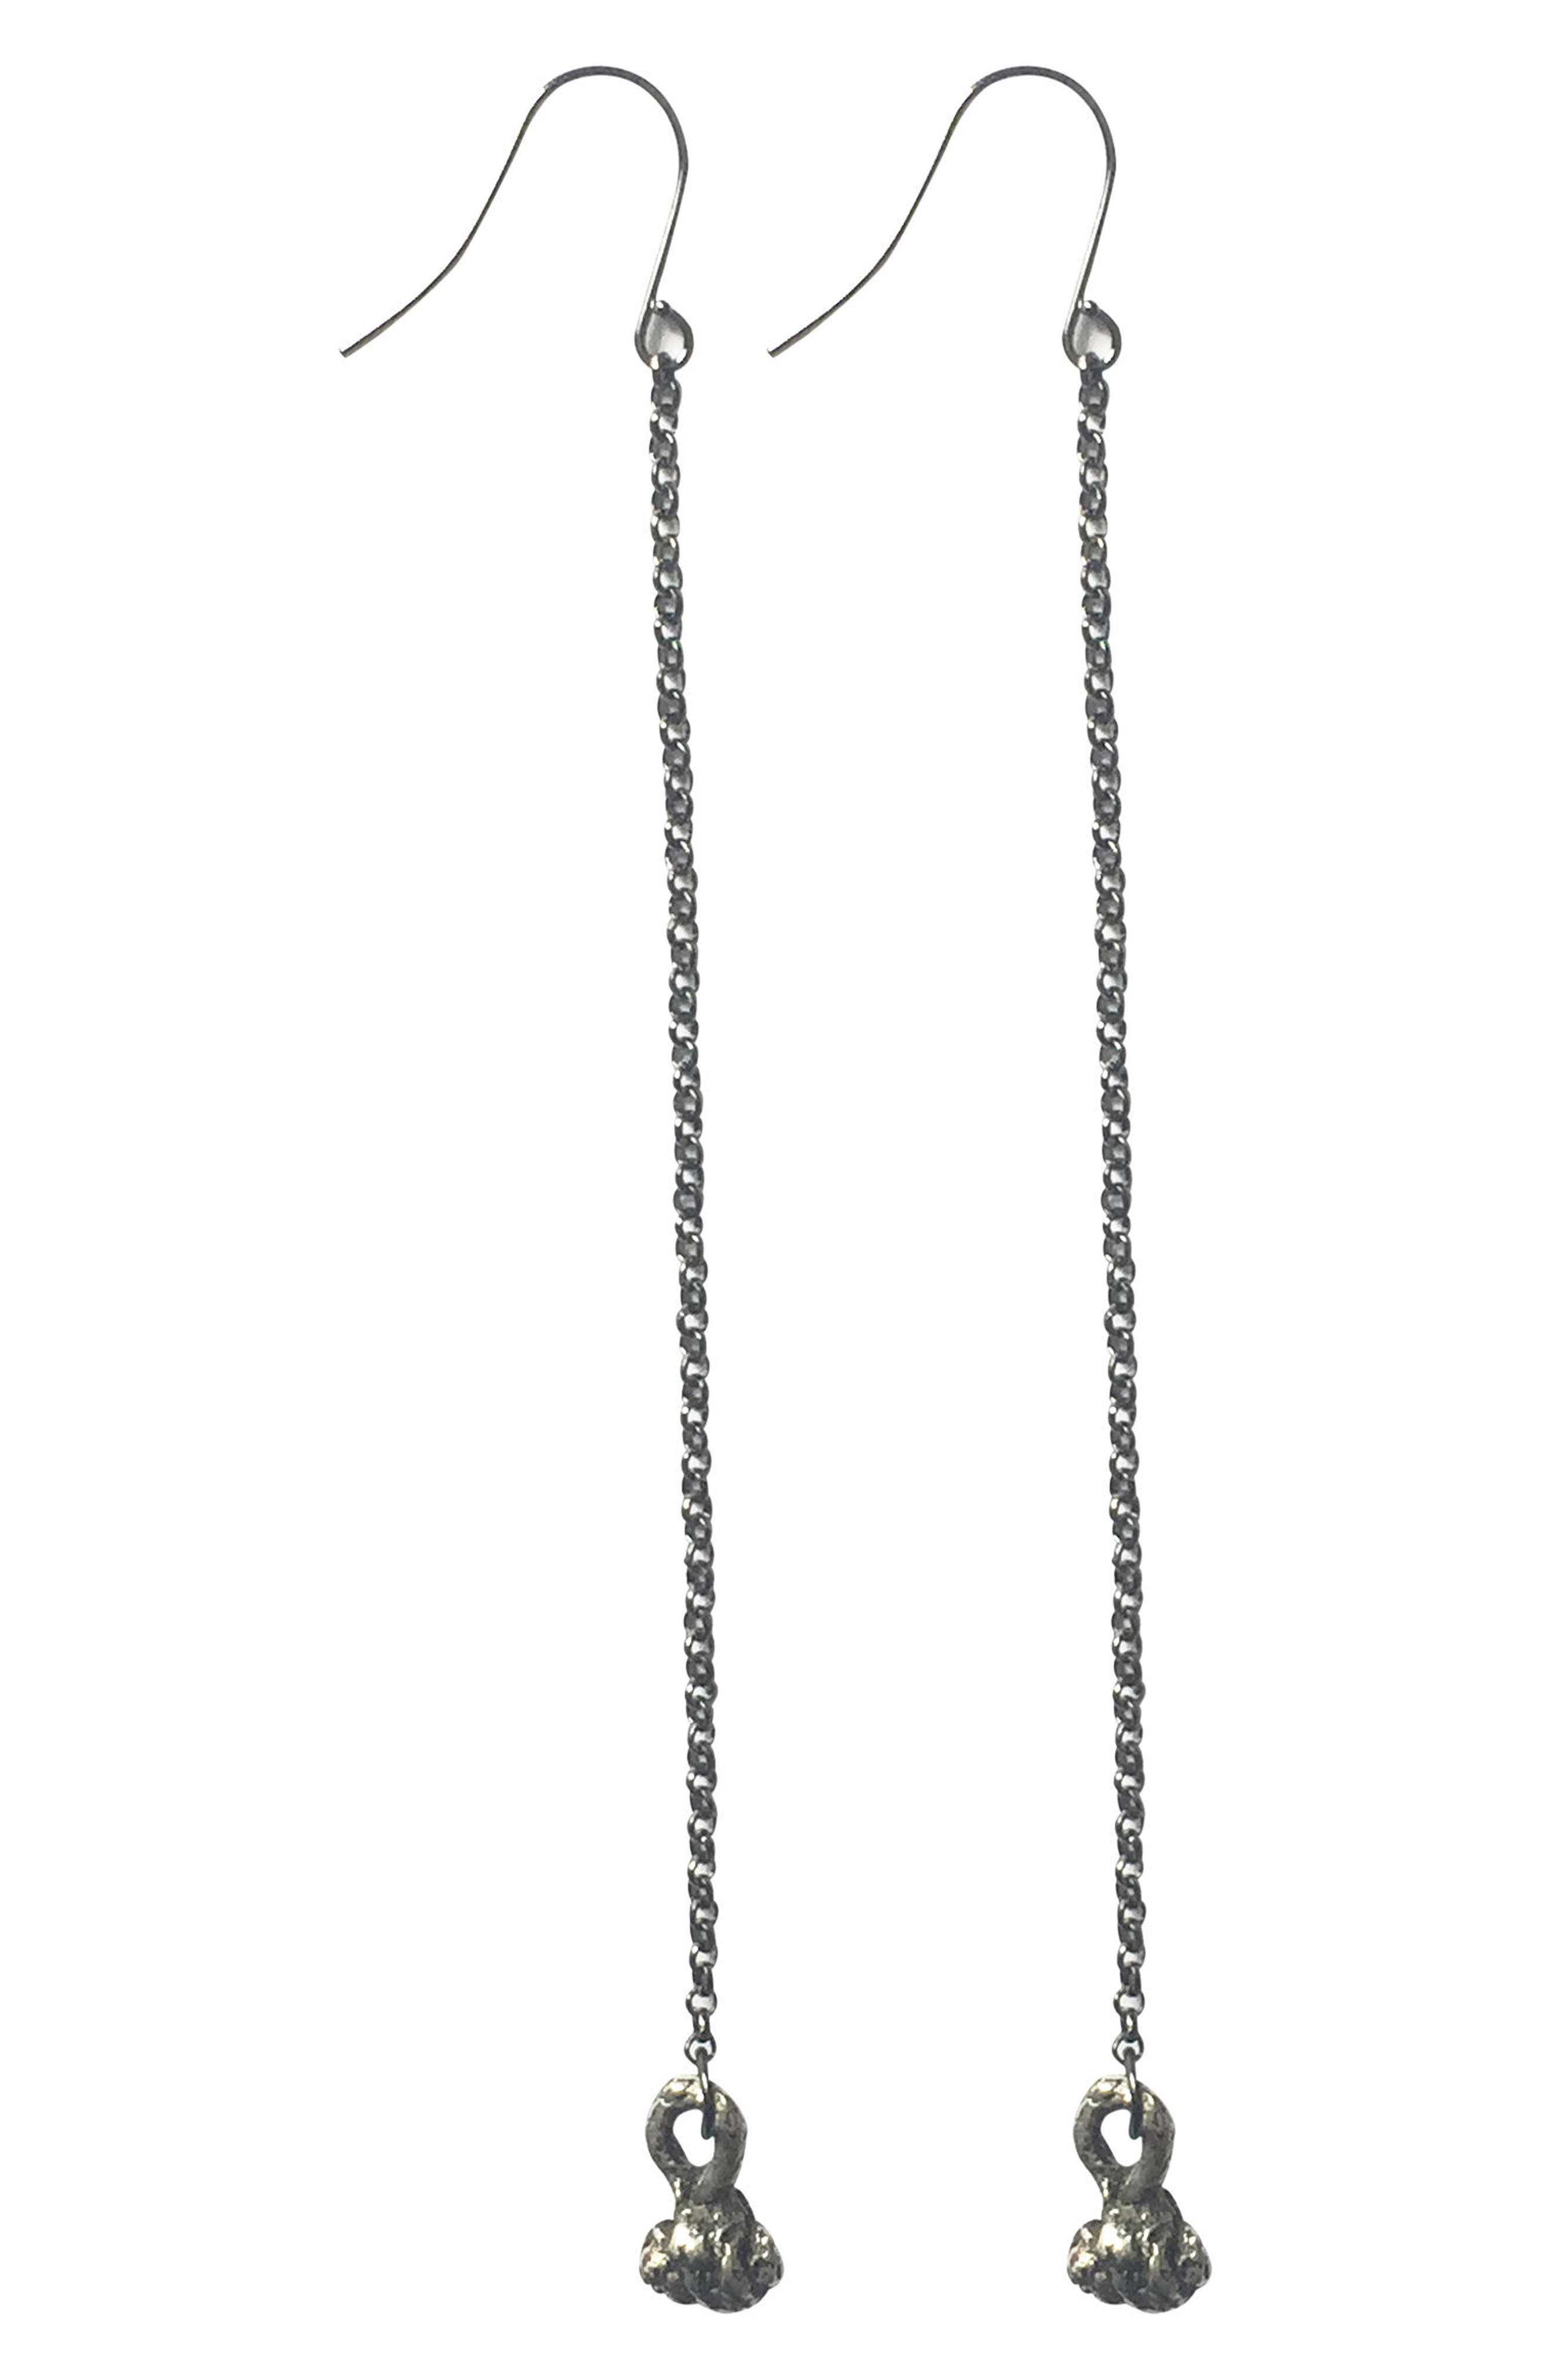 Chain Drop Earrings,                             Main thumbnail 1, color,                             Oxidized Silver/ Gunmetal